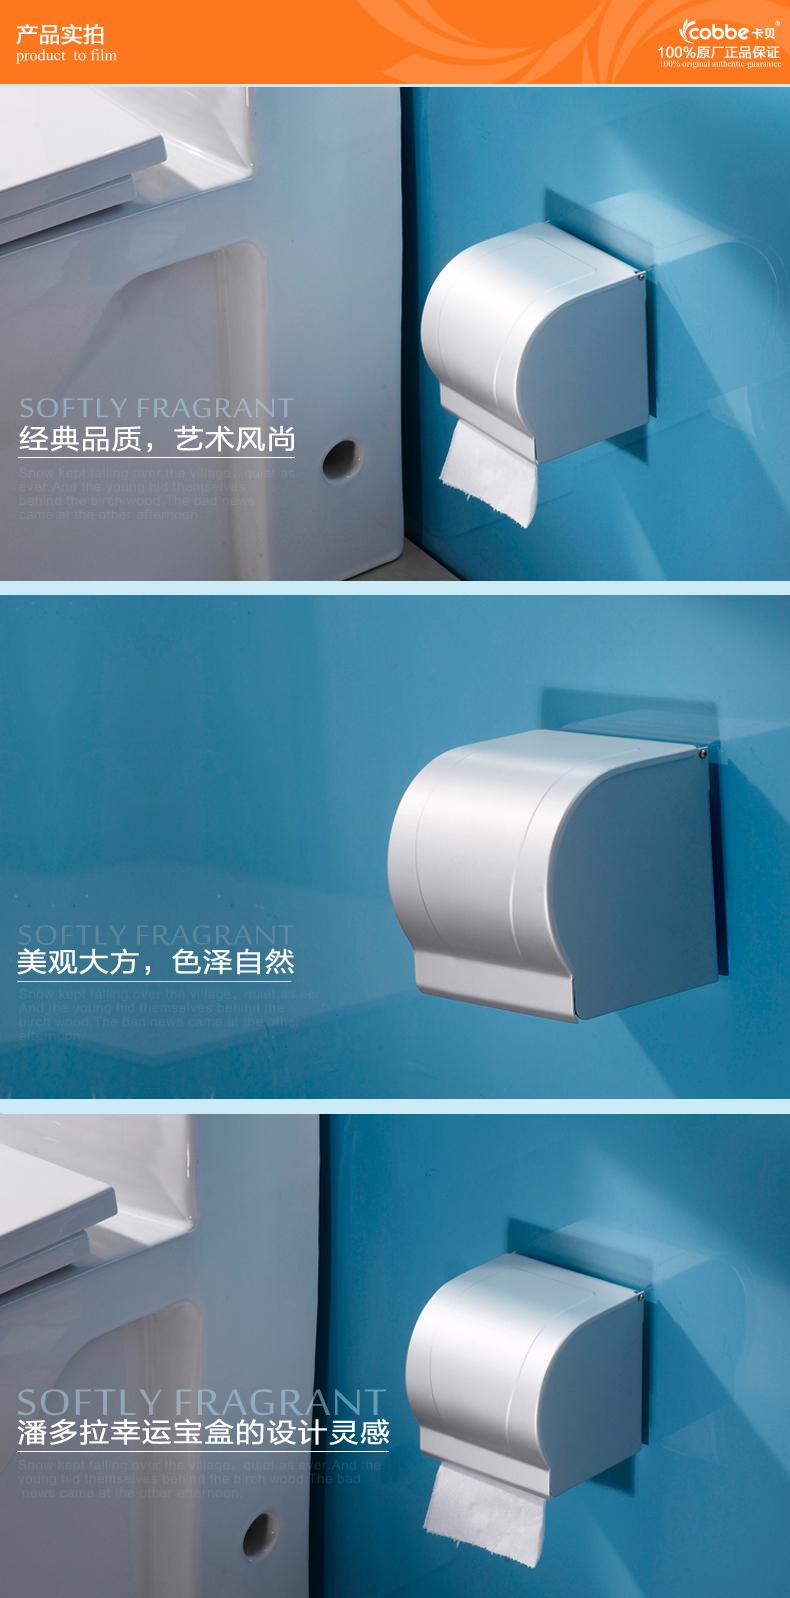 Cobbe Cabernet space aluminum bathroom towel rack toilet water toilet paper cartridge box hand cartons creative 11301